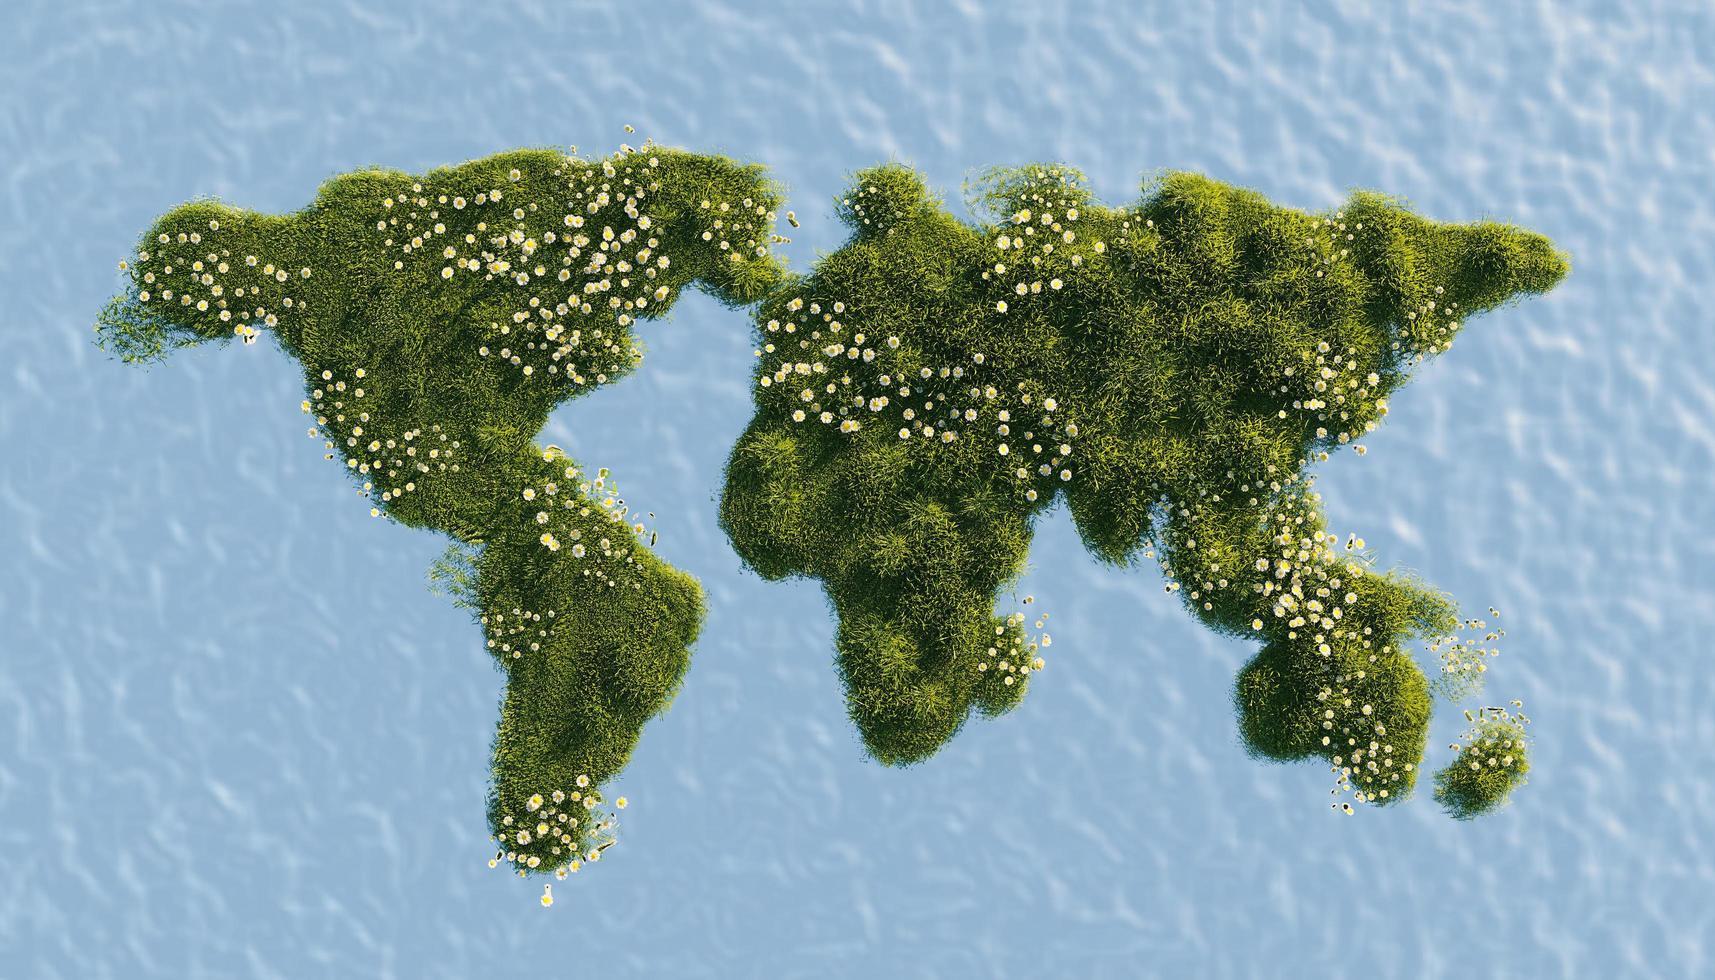 World map full of vegetation and spring flowers photo